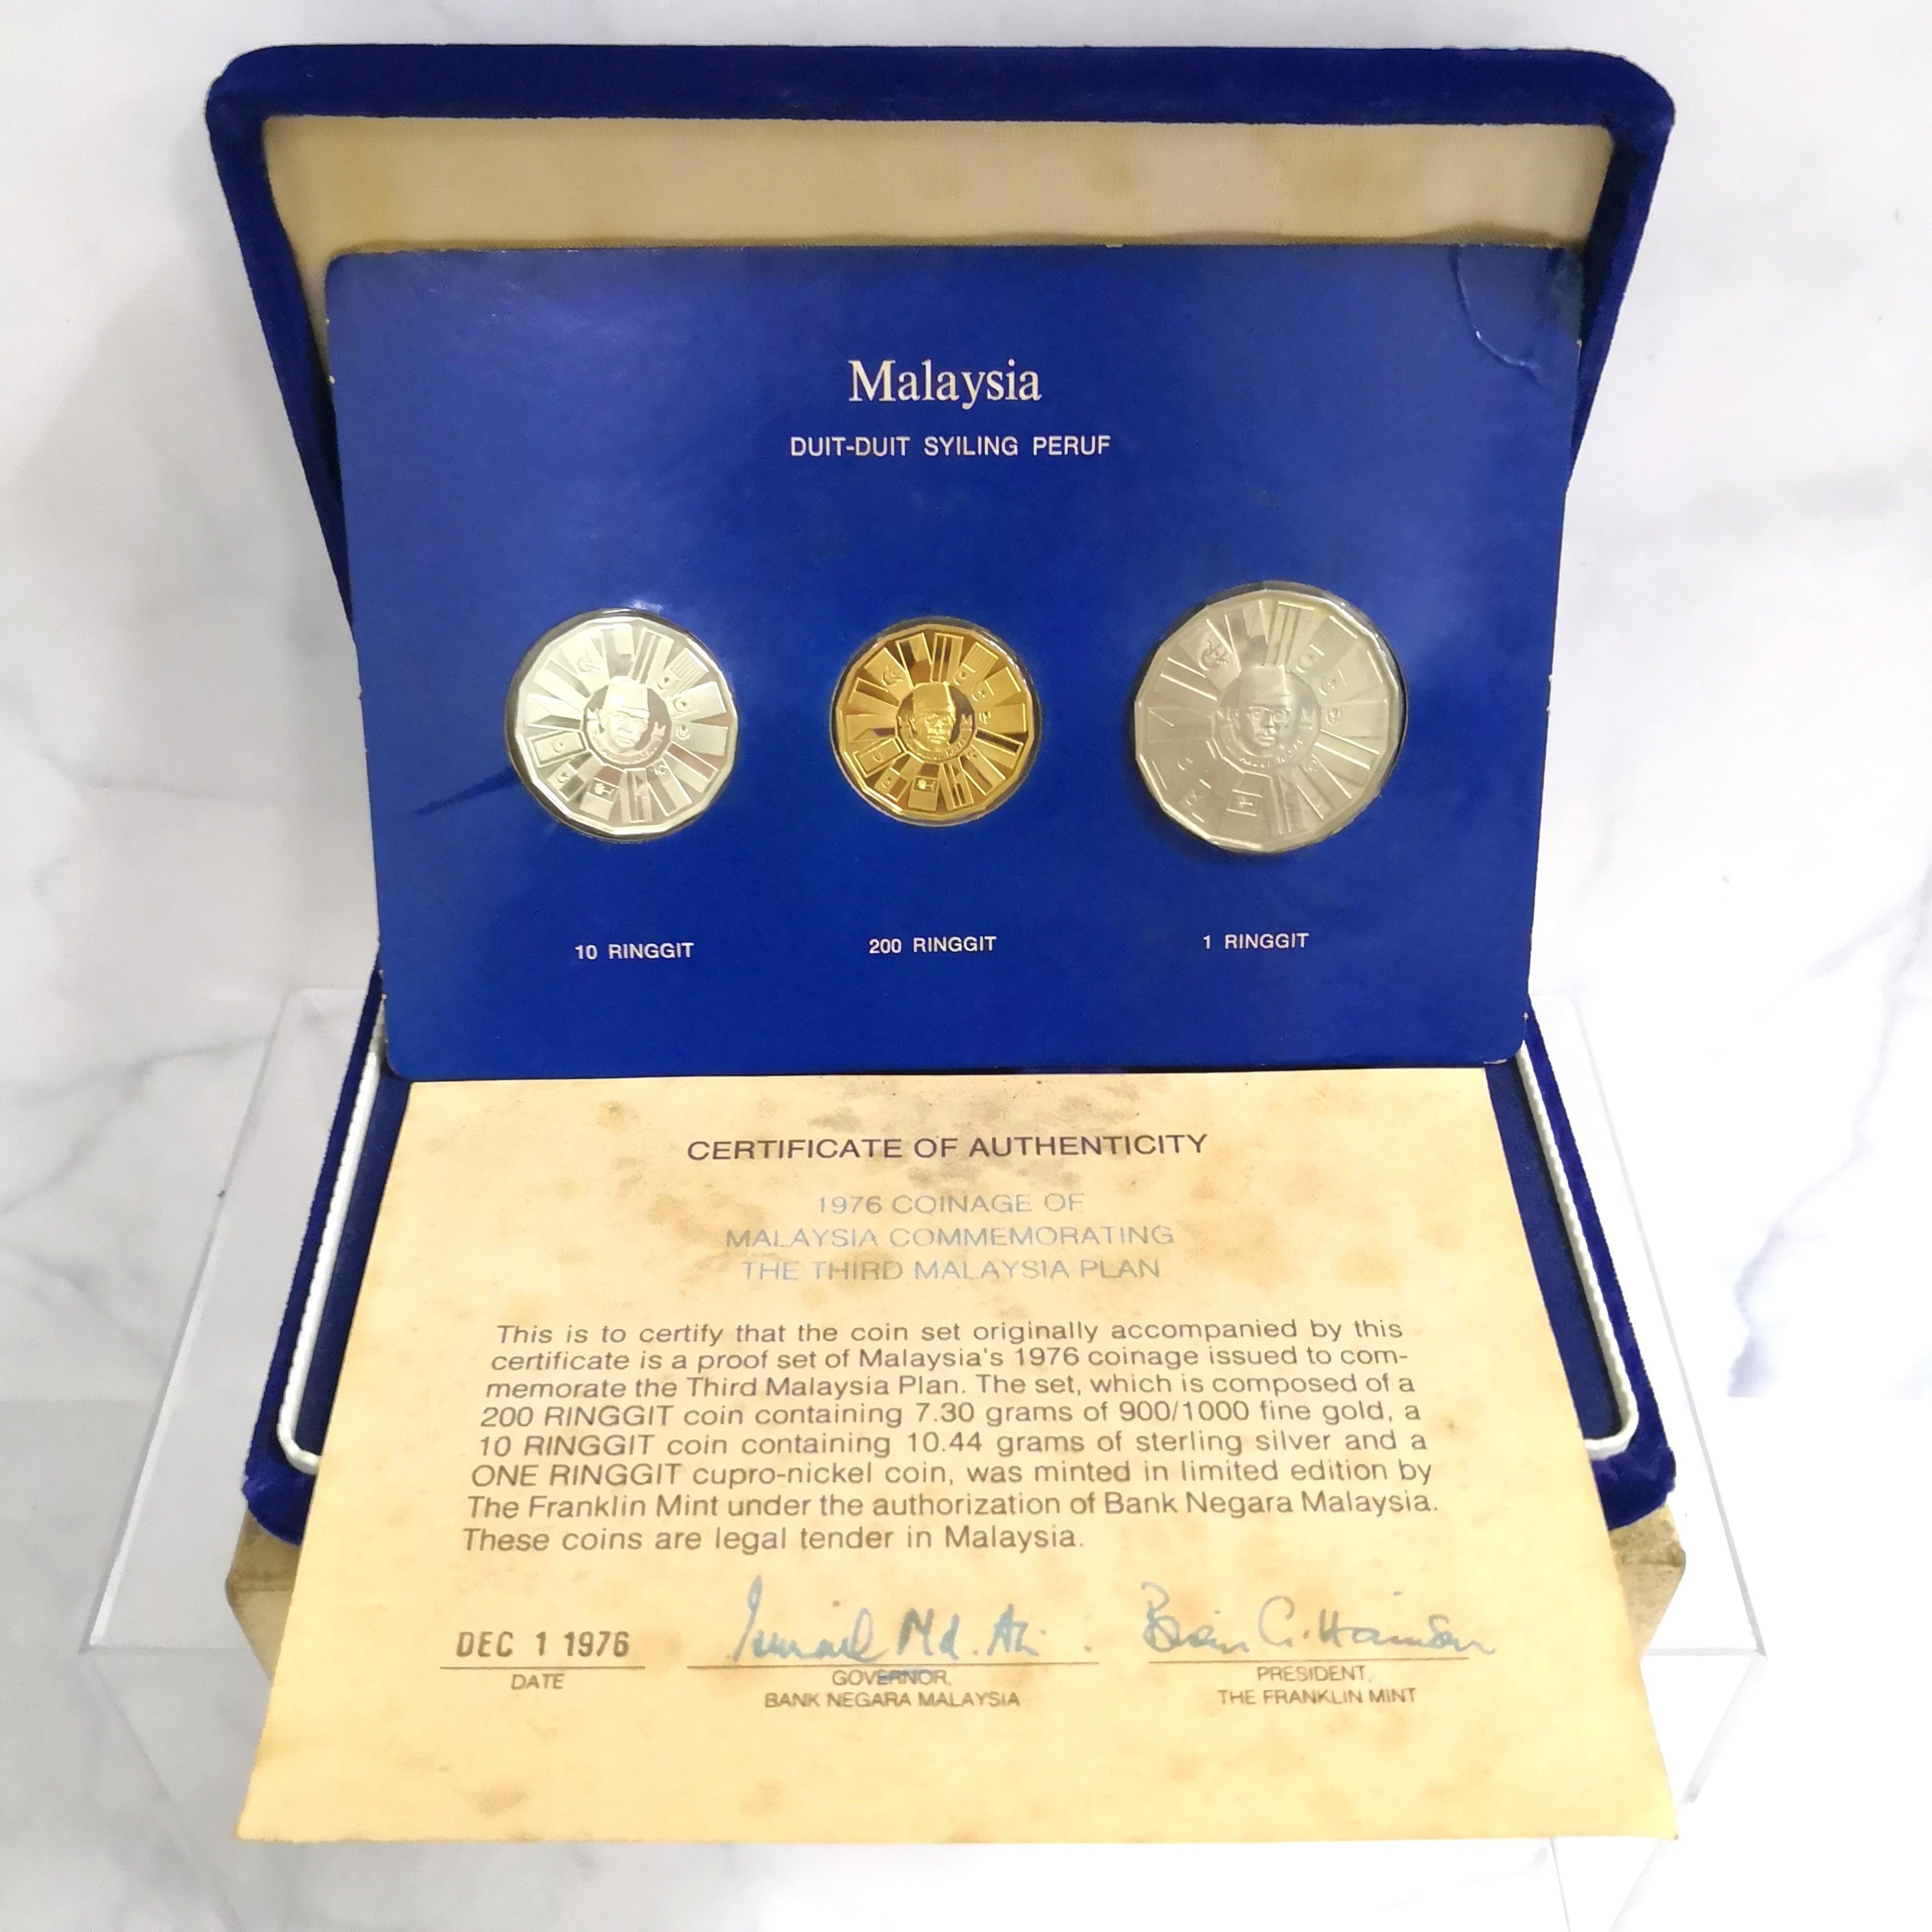 1976 3rd Malaysia Plan RM1, RM10, RM200 Proof Coin Set